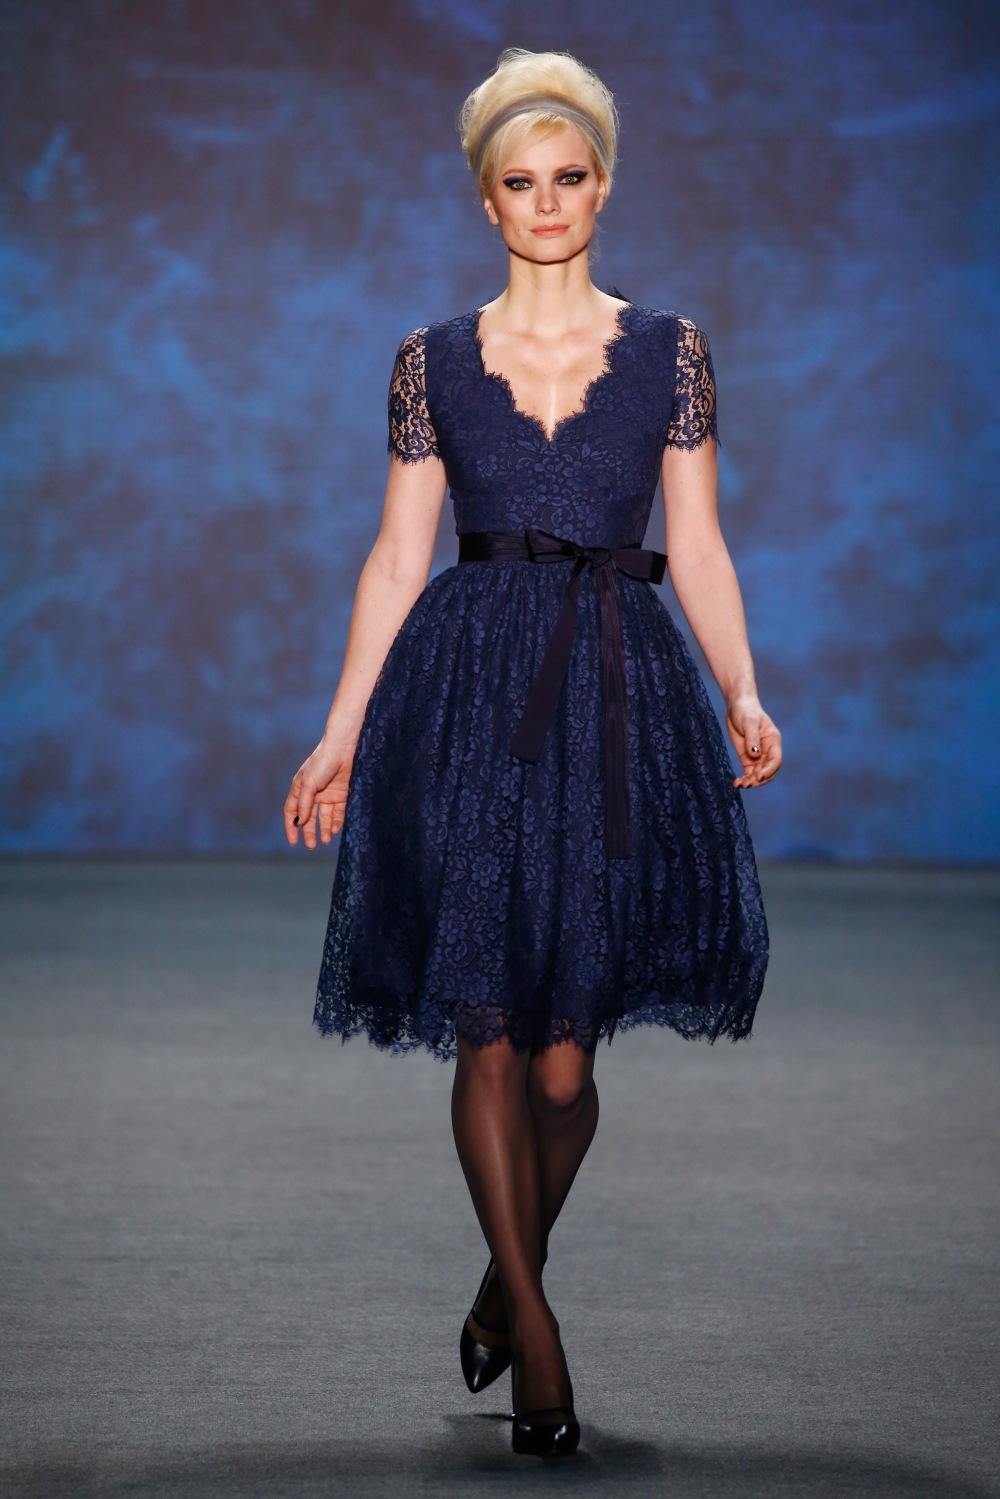 Lena Hoschek Show - Mercedes-Benz Fashion Week Berlin Autumn/Winter 2015/16